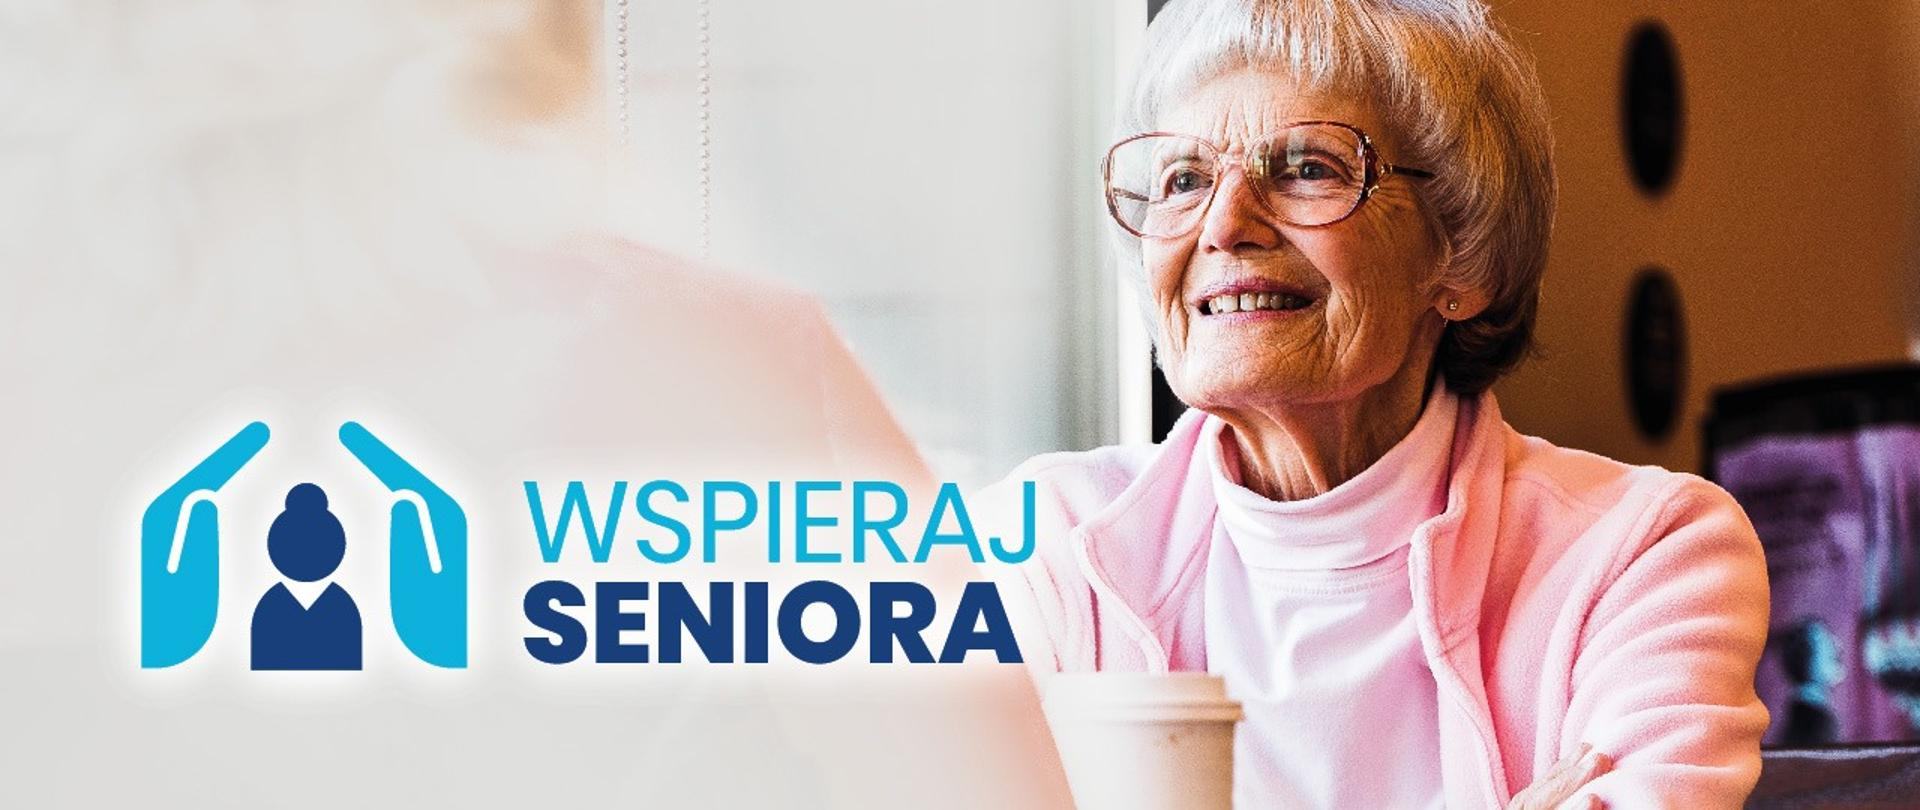 Logo akcji Wspieraj Seniora